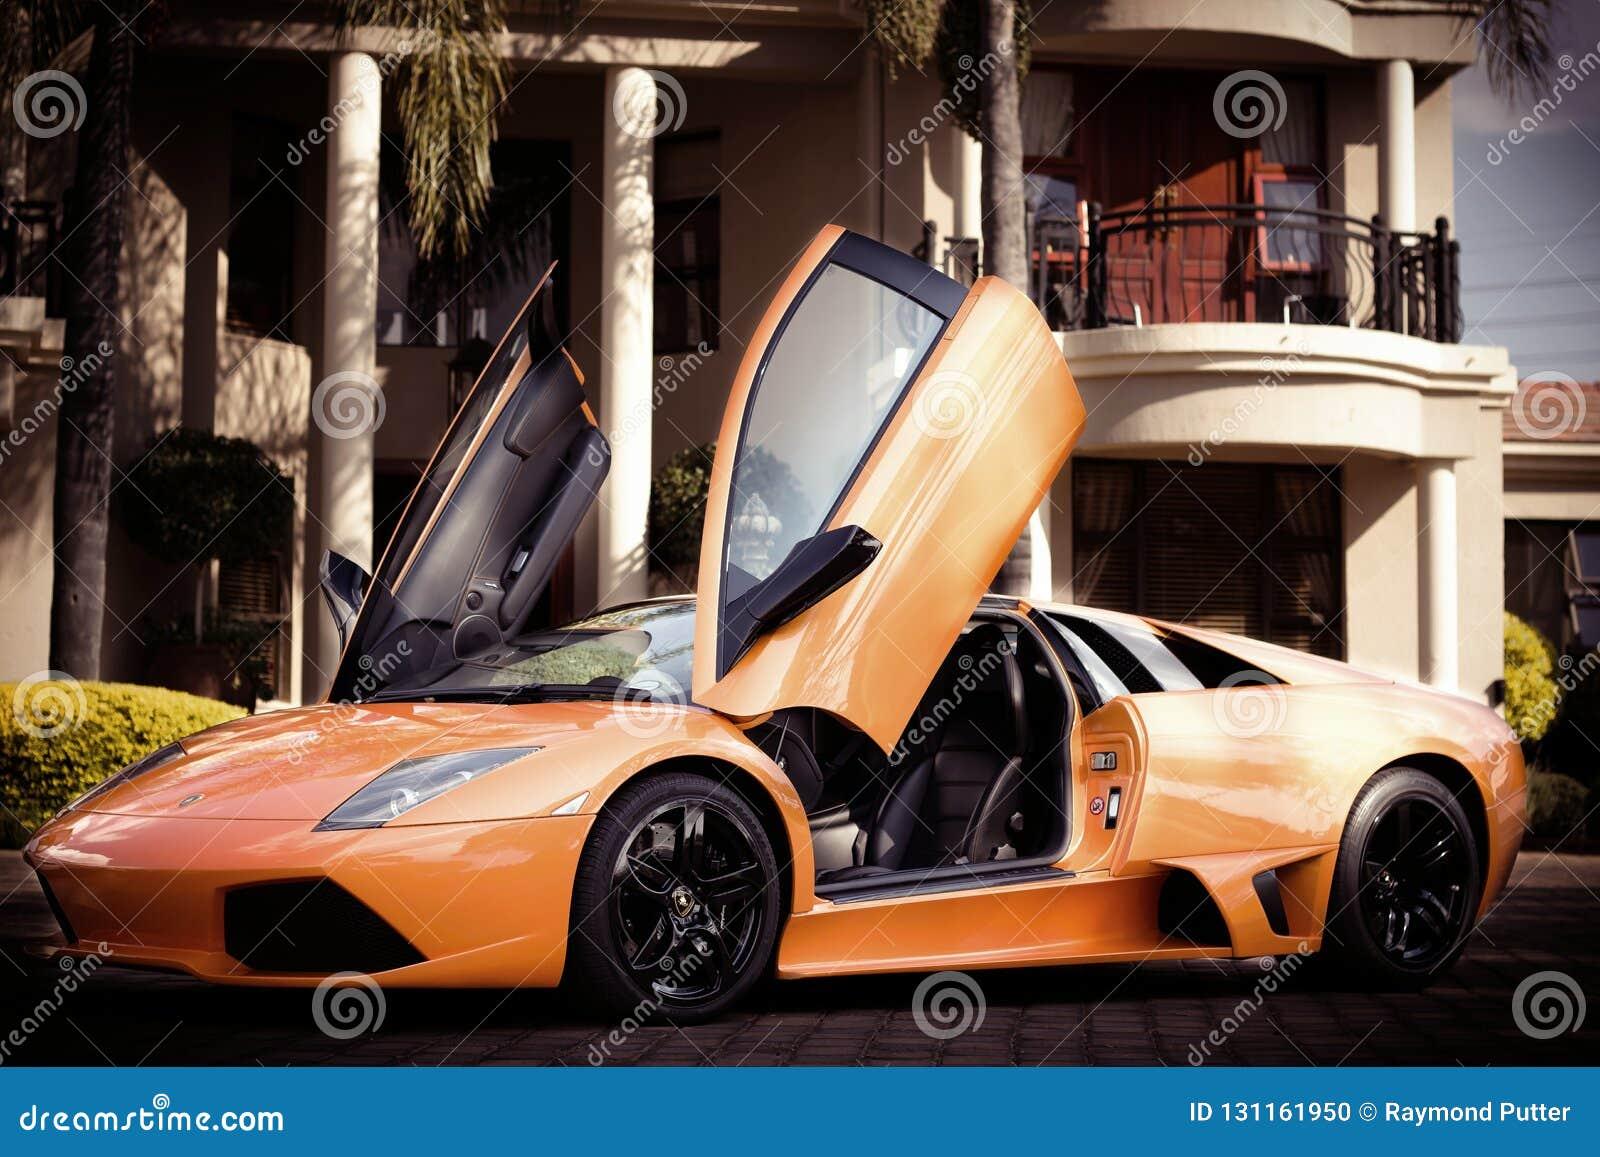 Lamborghini in Mantion